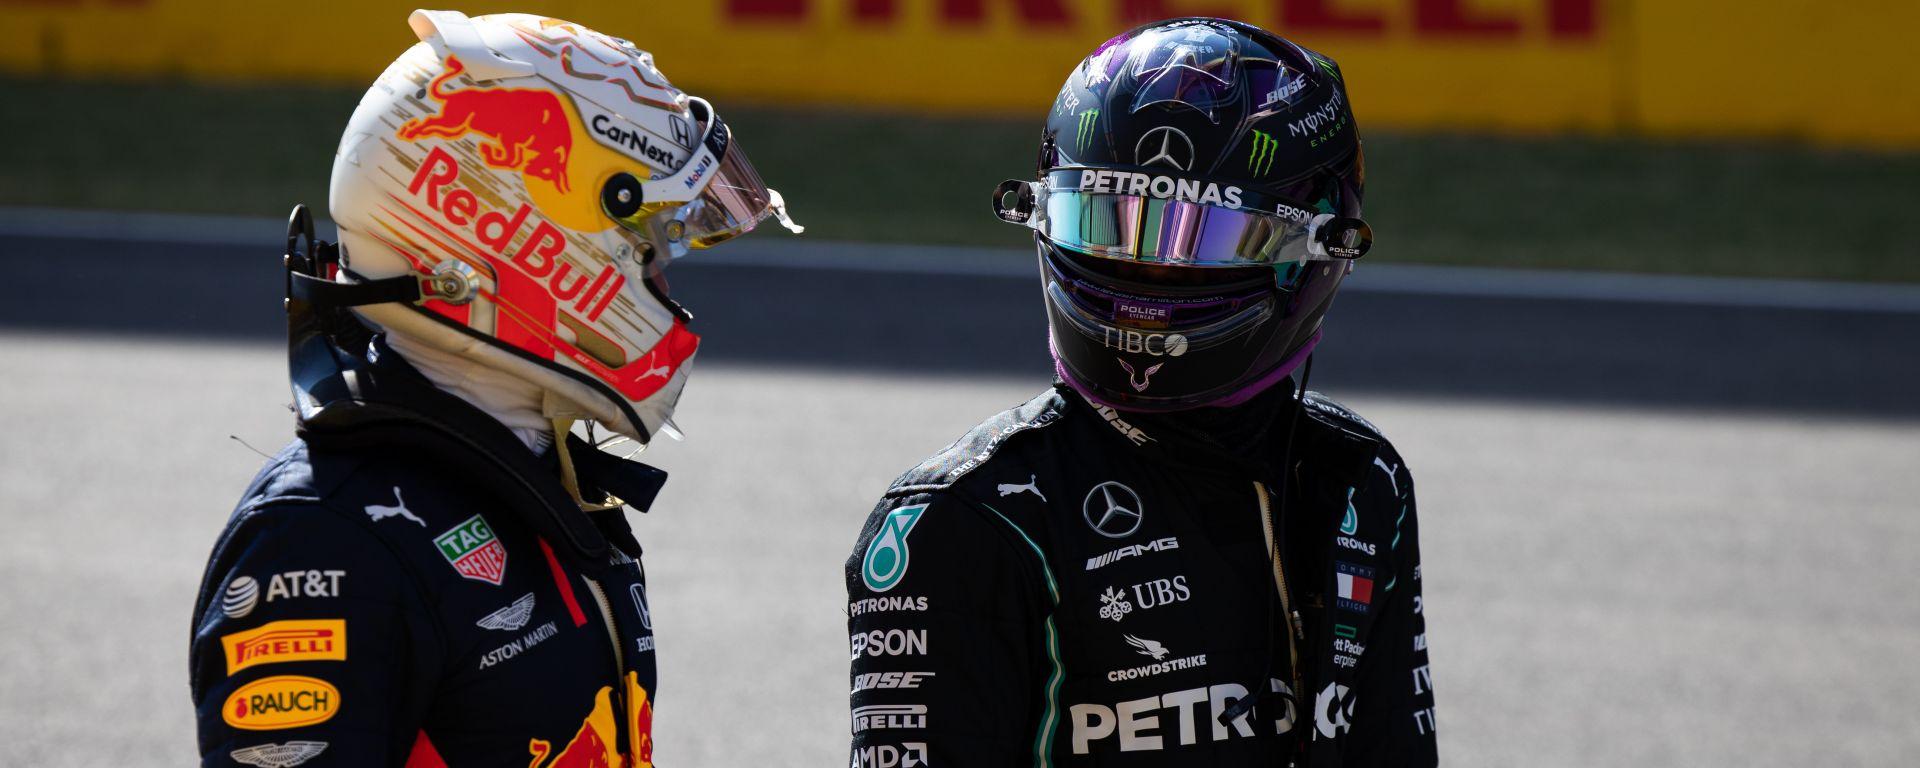 F1, GP Toscana 2020: Max Verstappen (Red Bull) e Lewis Hamilton (Mercedes)